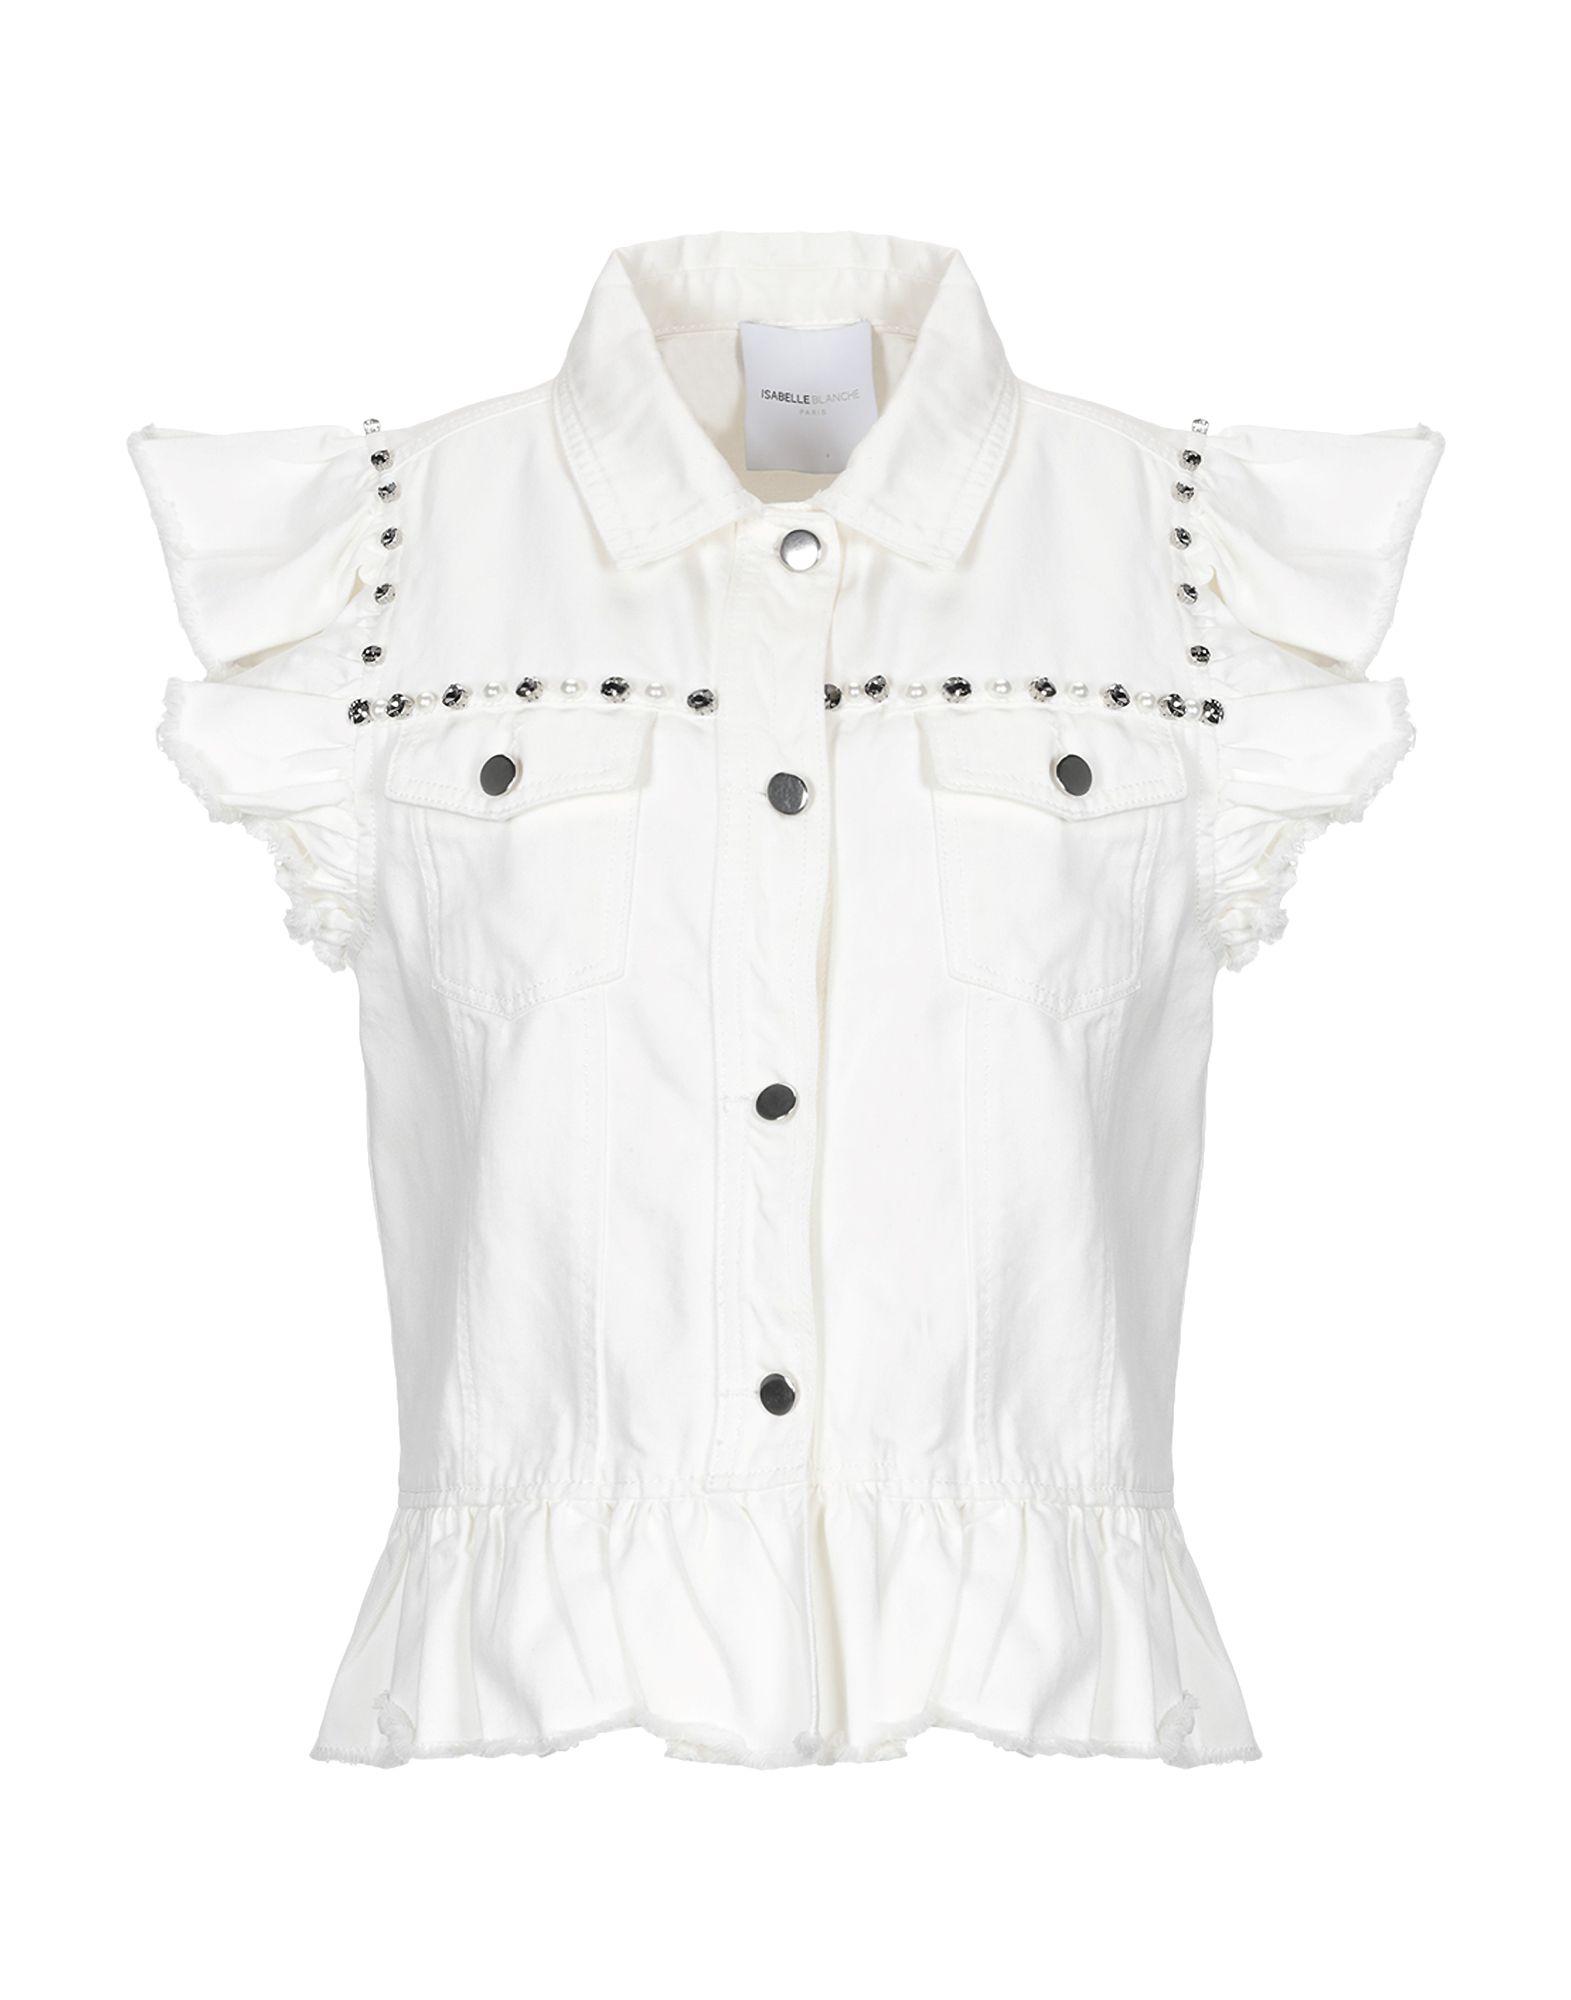 цена ISABELLE BLANCHE Paris Джинсовая верхняя одежда